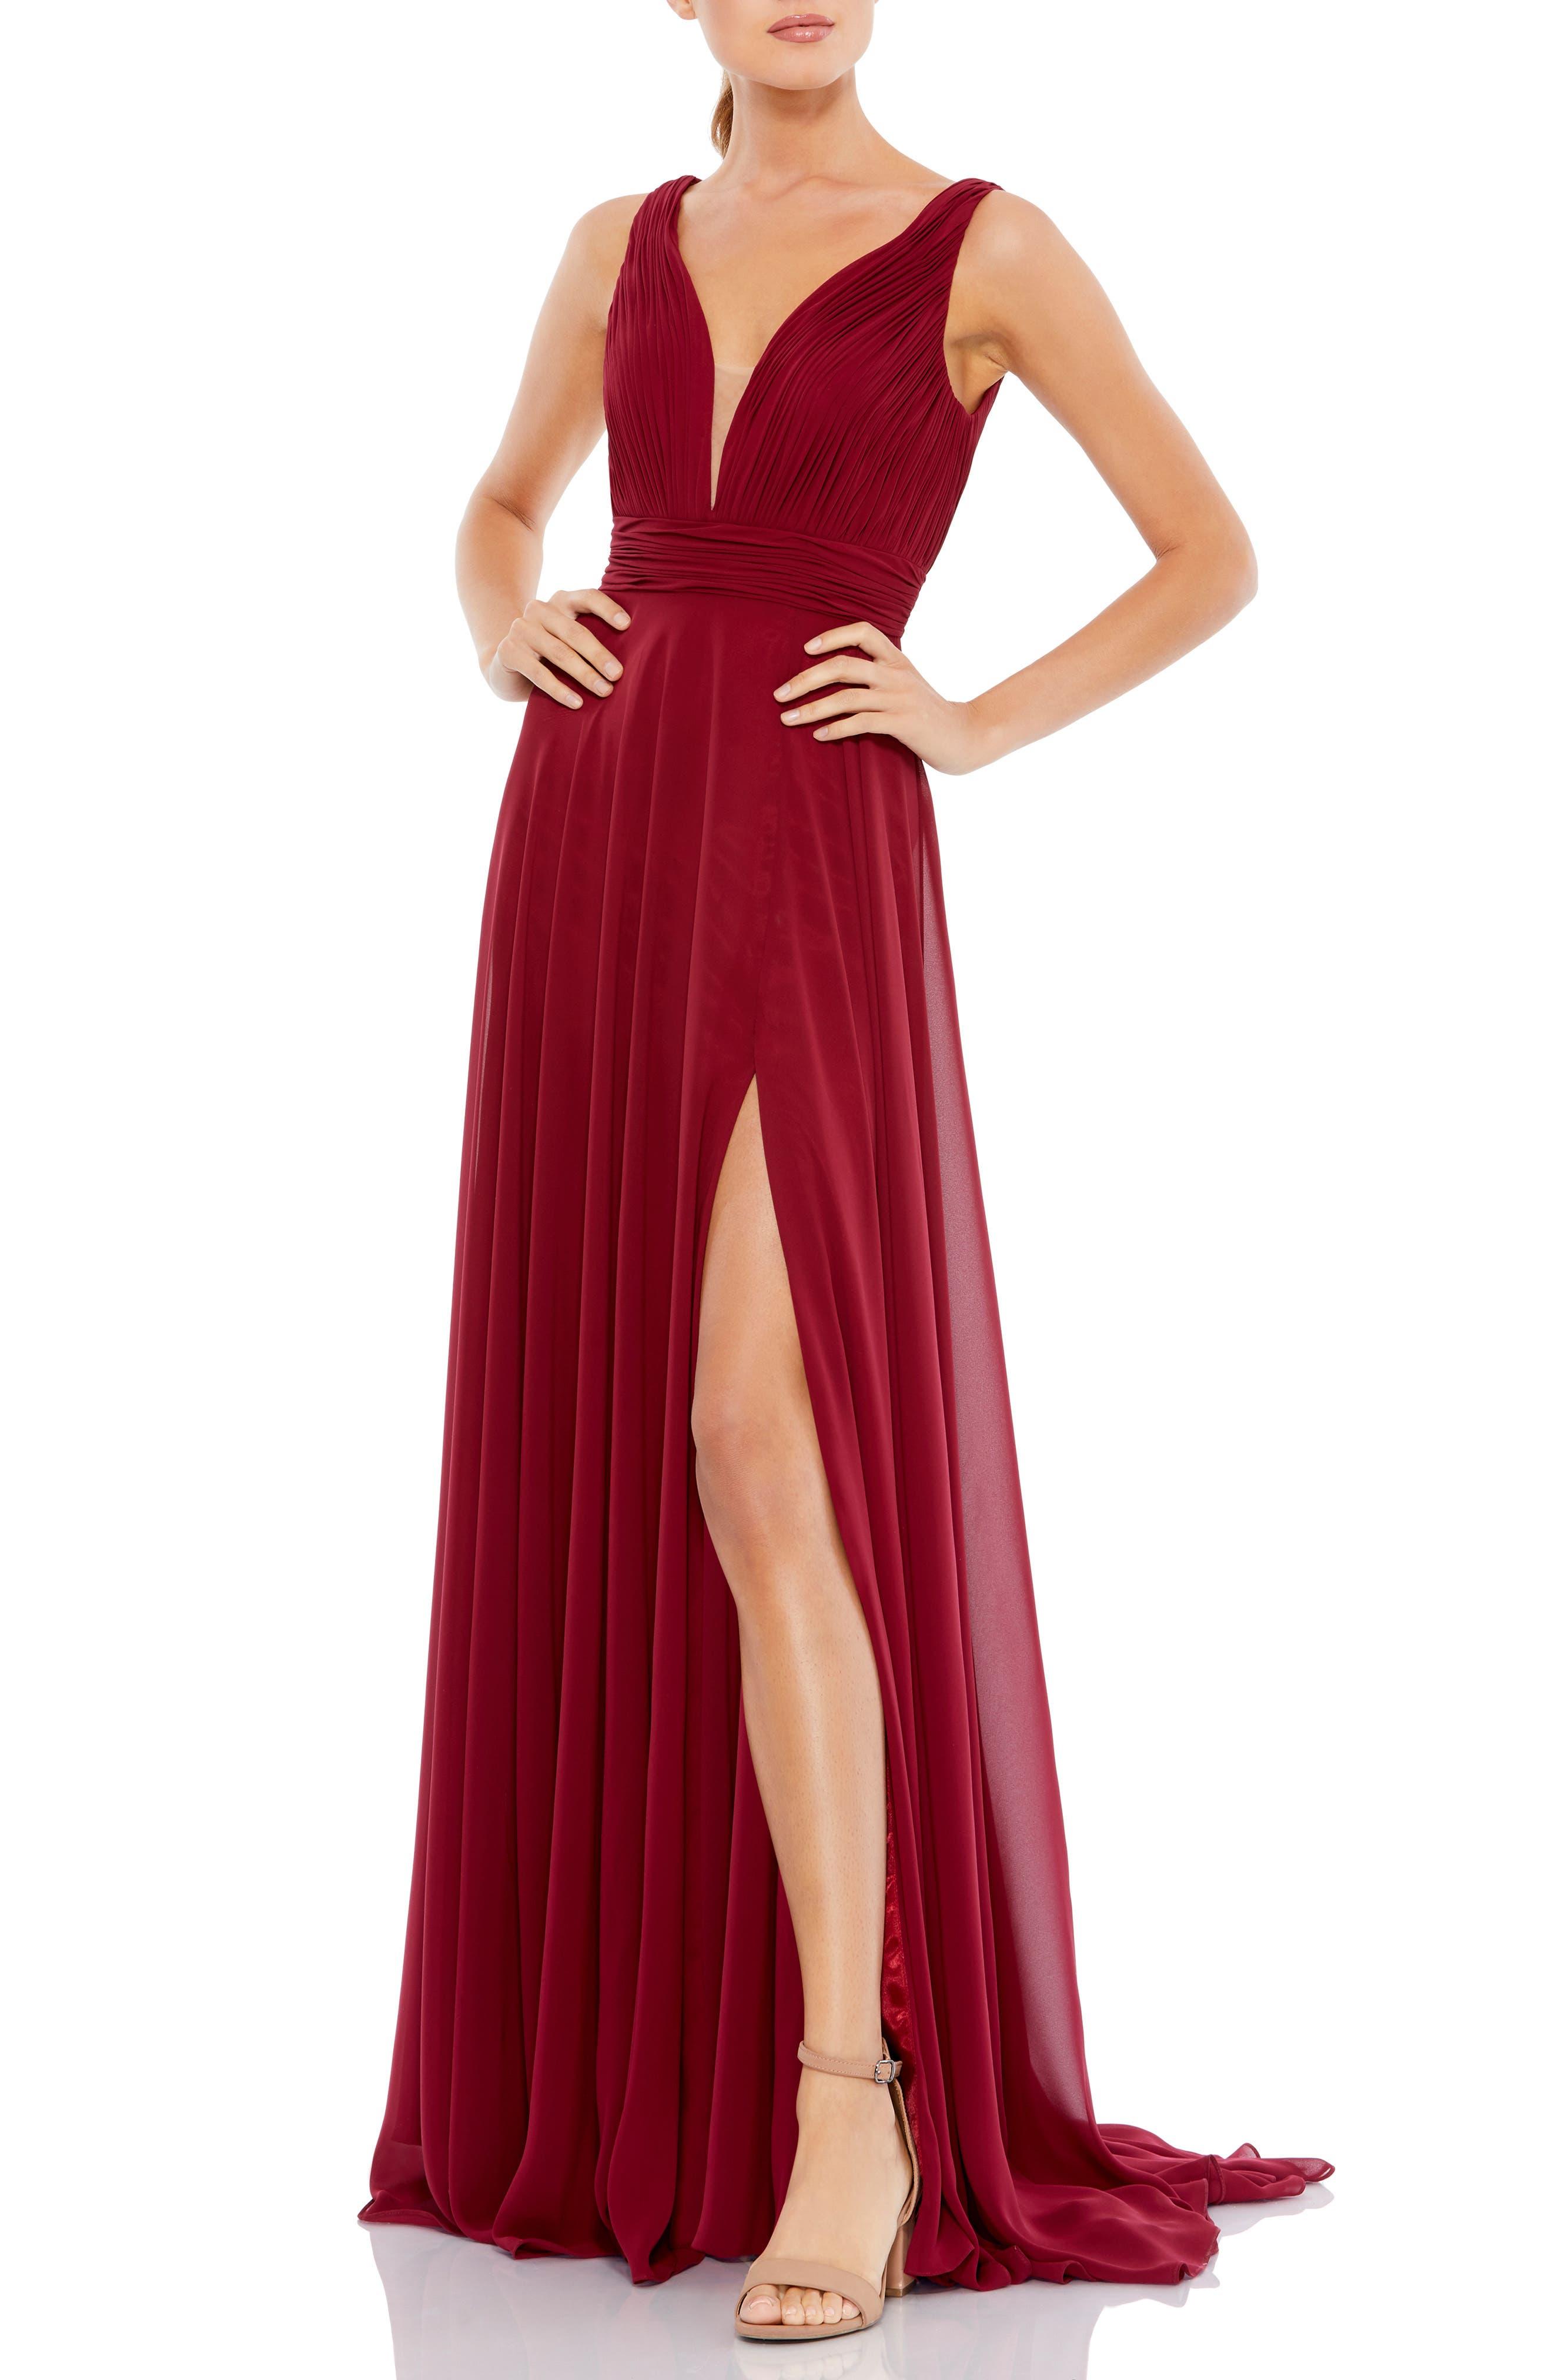 Plunge Neck Side Slit Chiffon A-Line Gown